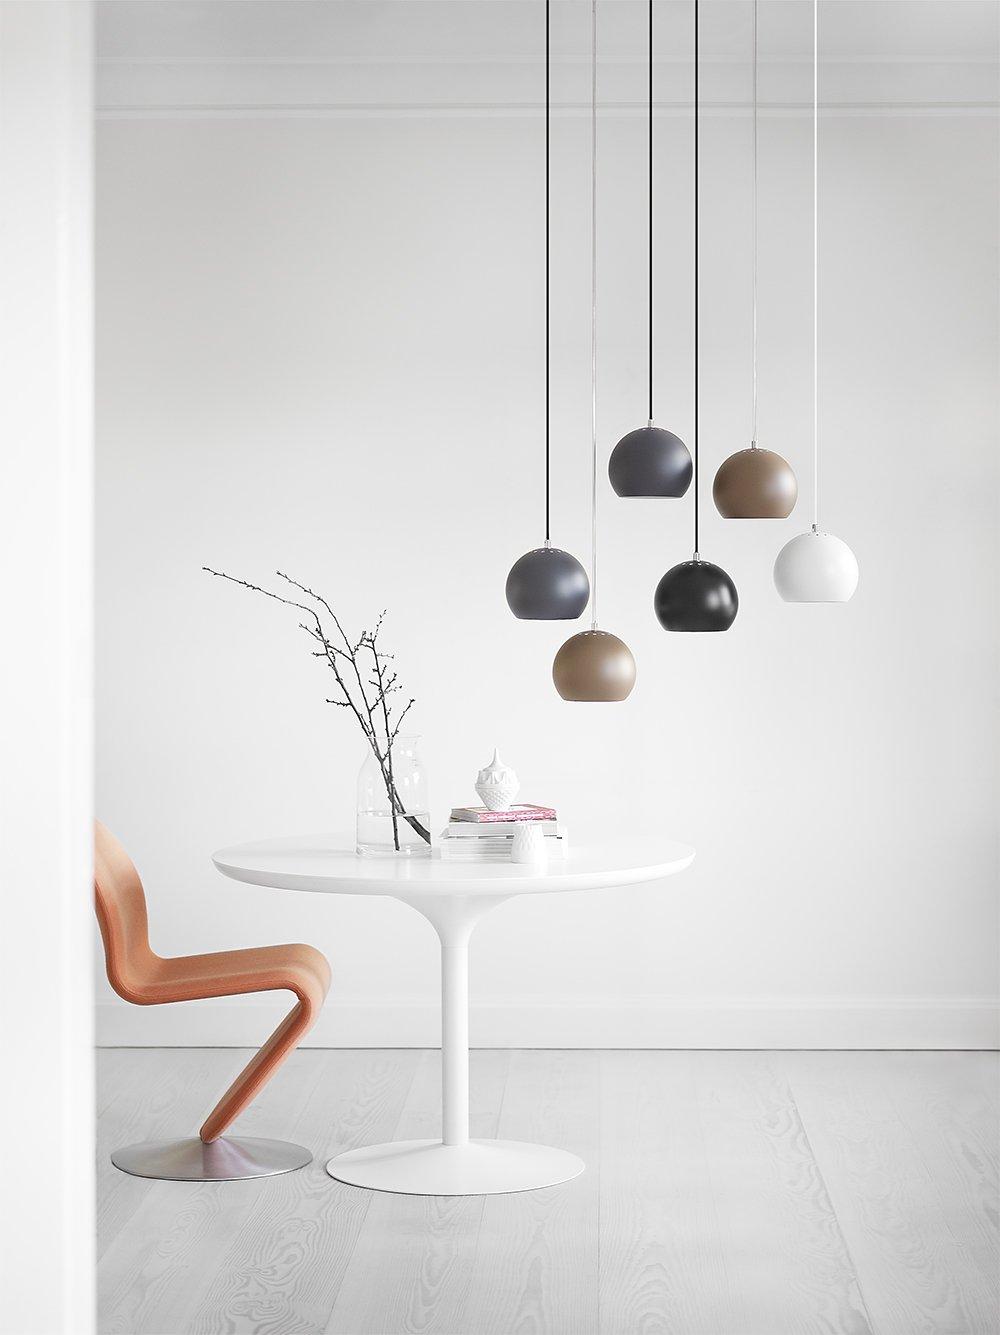 Lampy Ball - pojedyncze wiszące kule Frandsen